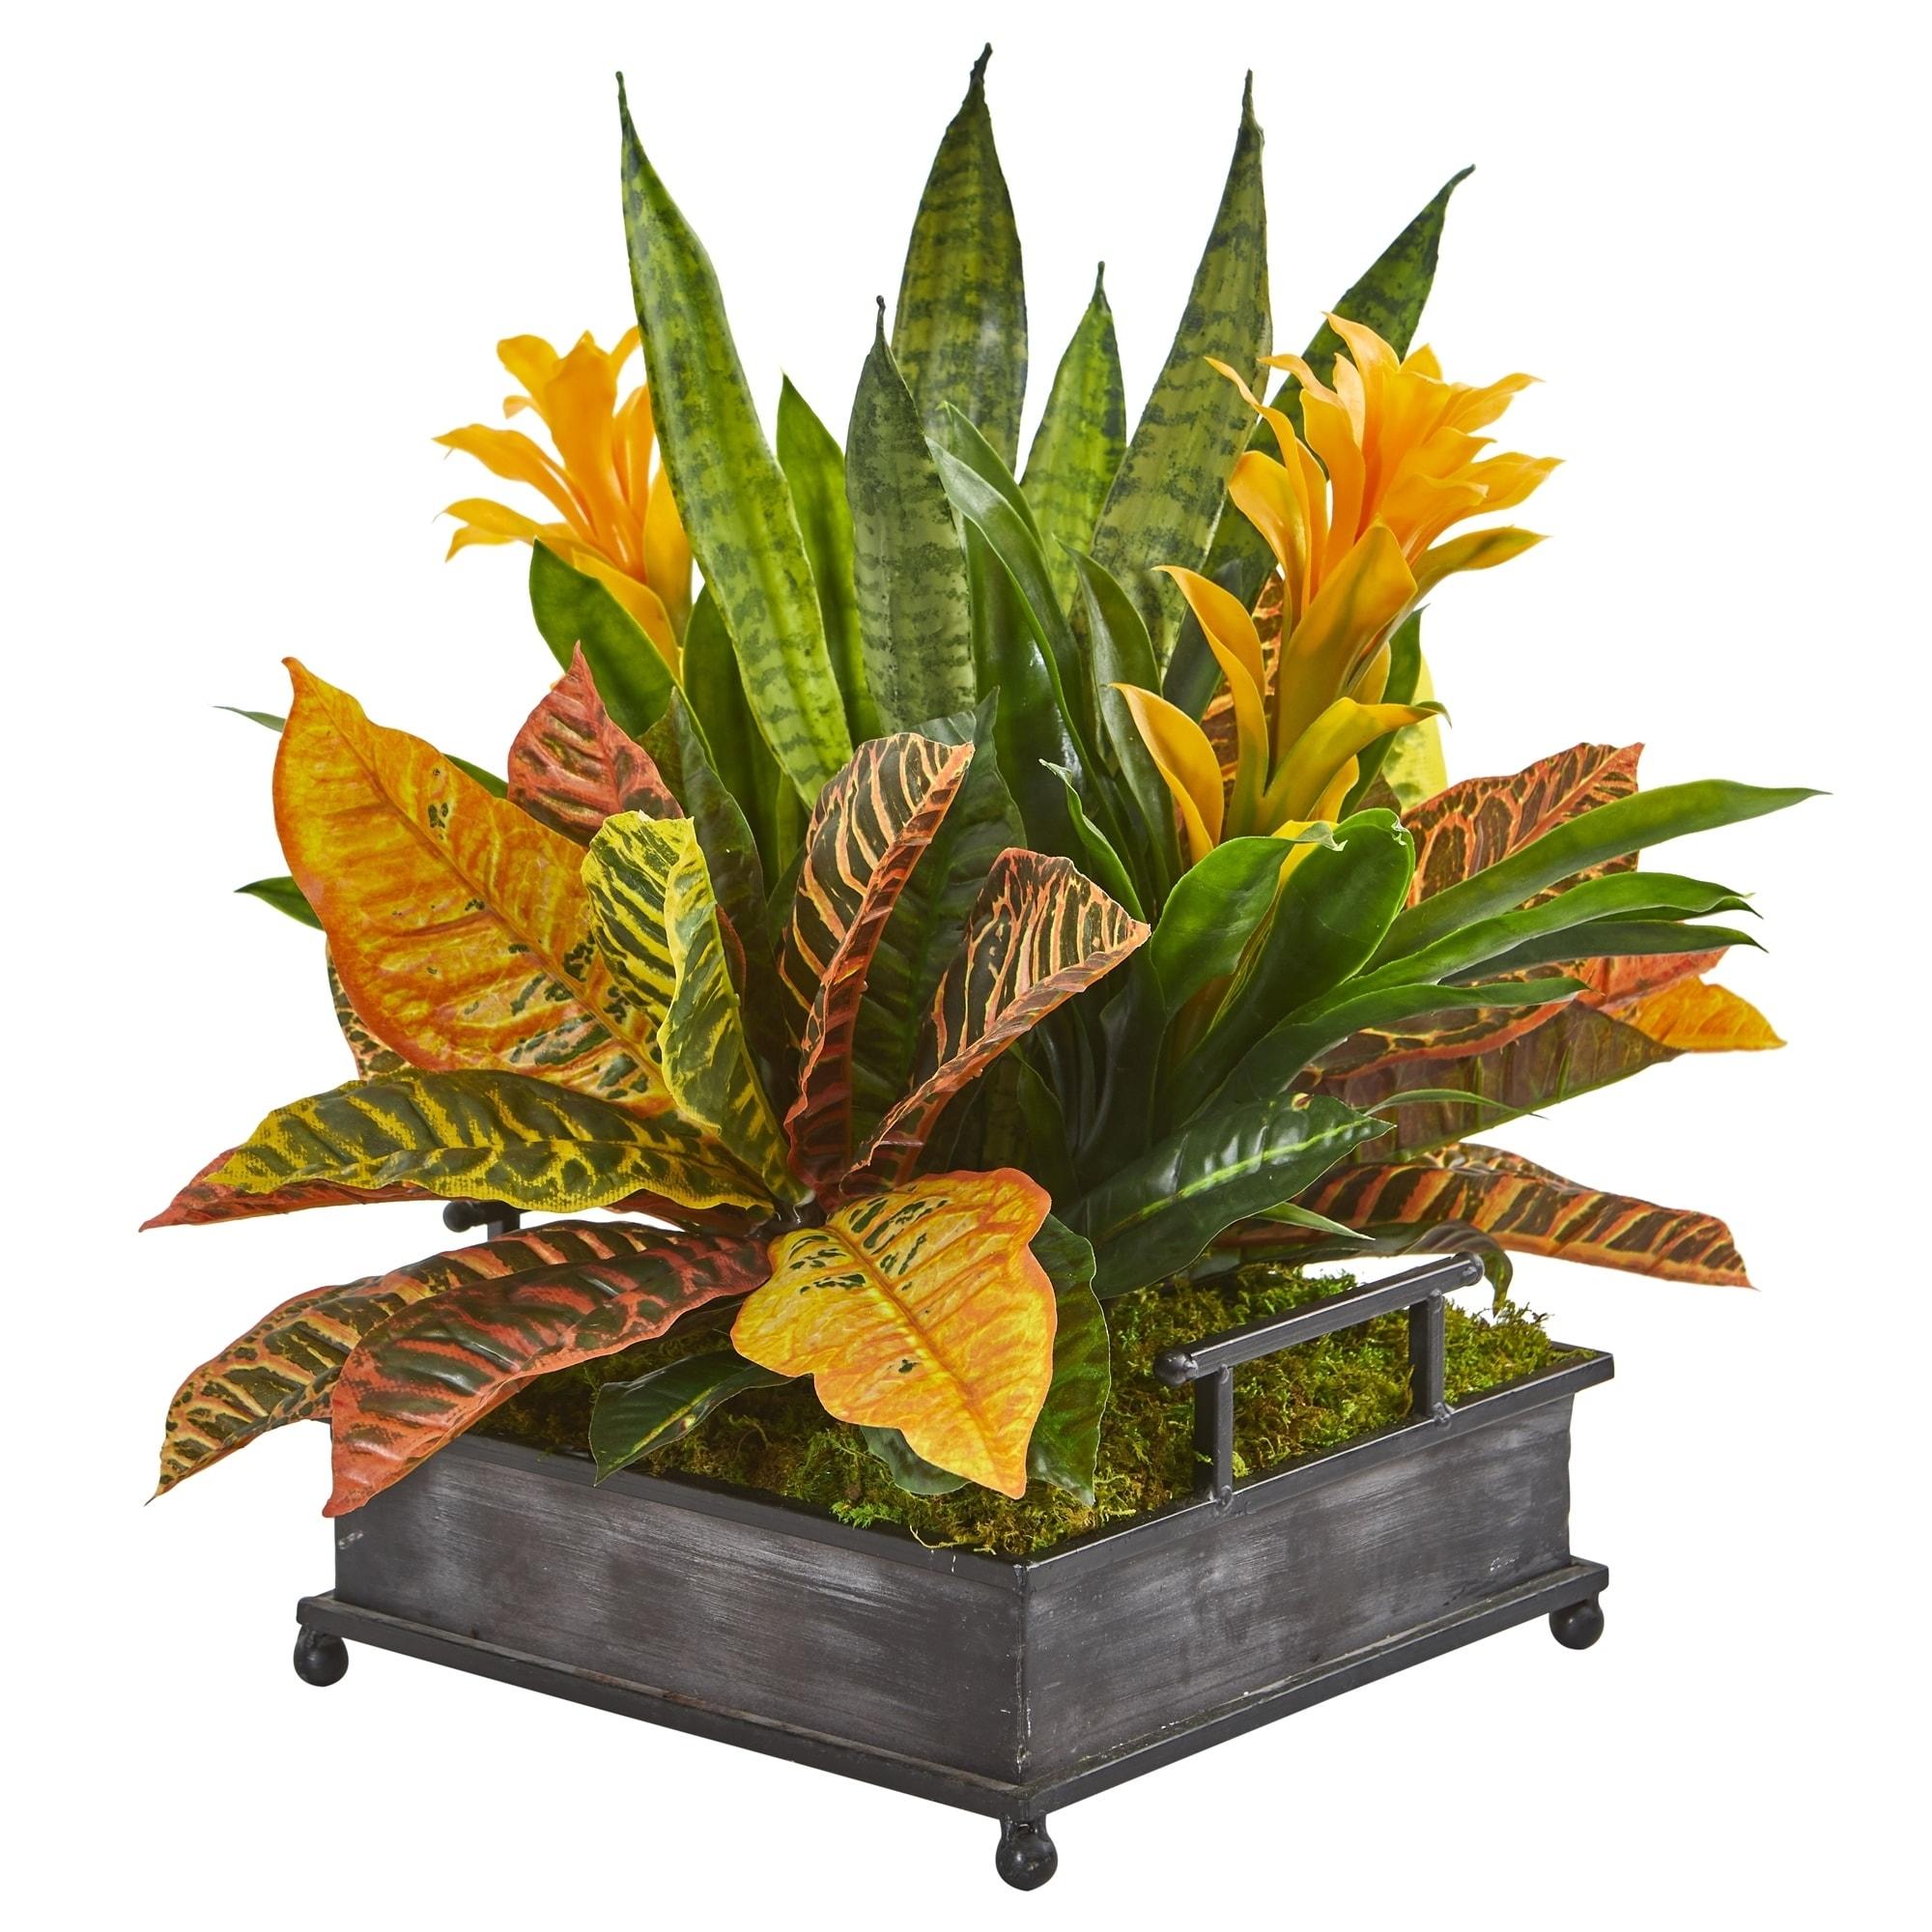 18 Bromeliad, Croton and Sansevieria Artificial Plant in Decorative Tray